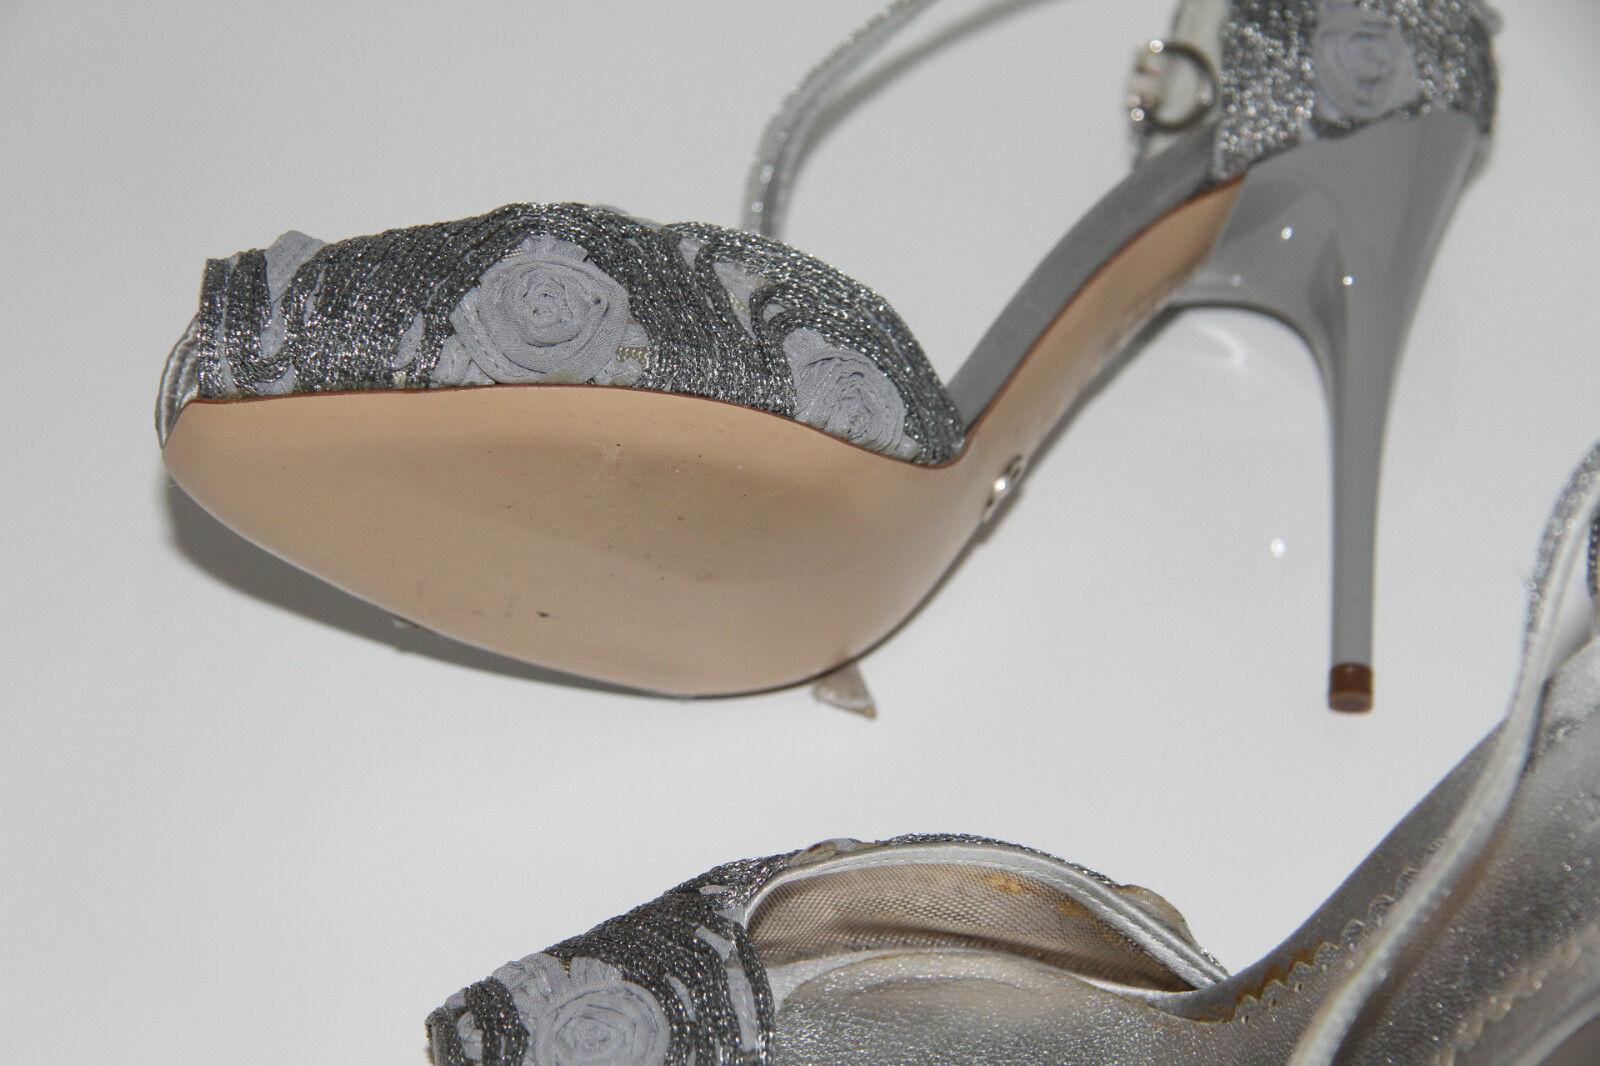 ARMANI Haute Couture Pumps open toes High Heels - sehr edel - Unikat - NEU